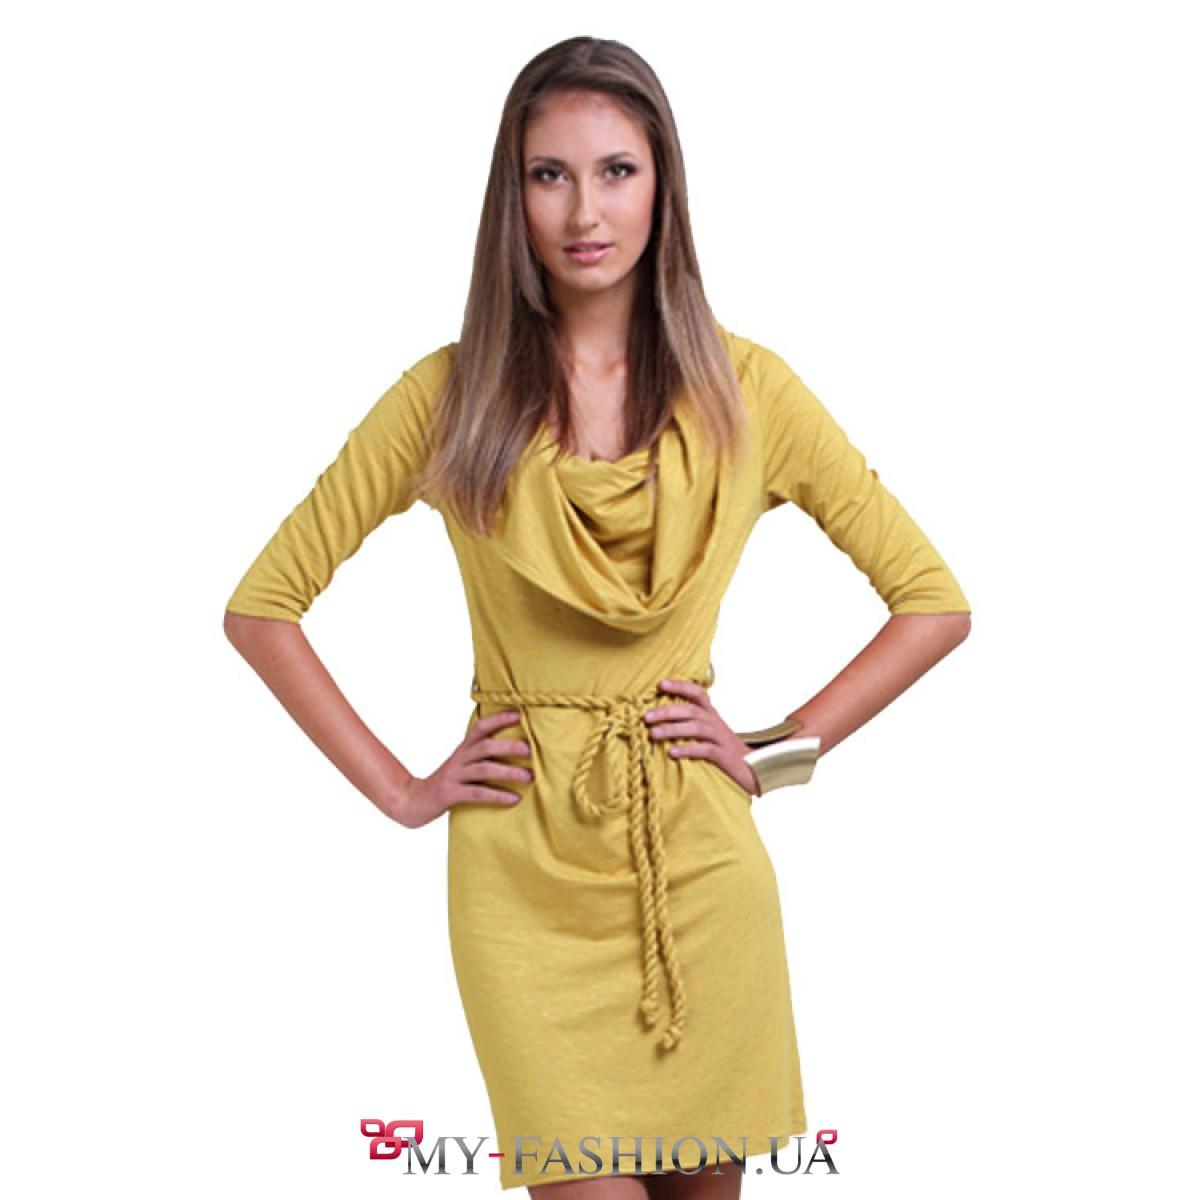 Блузка боди интернет магазин доставка